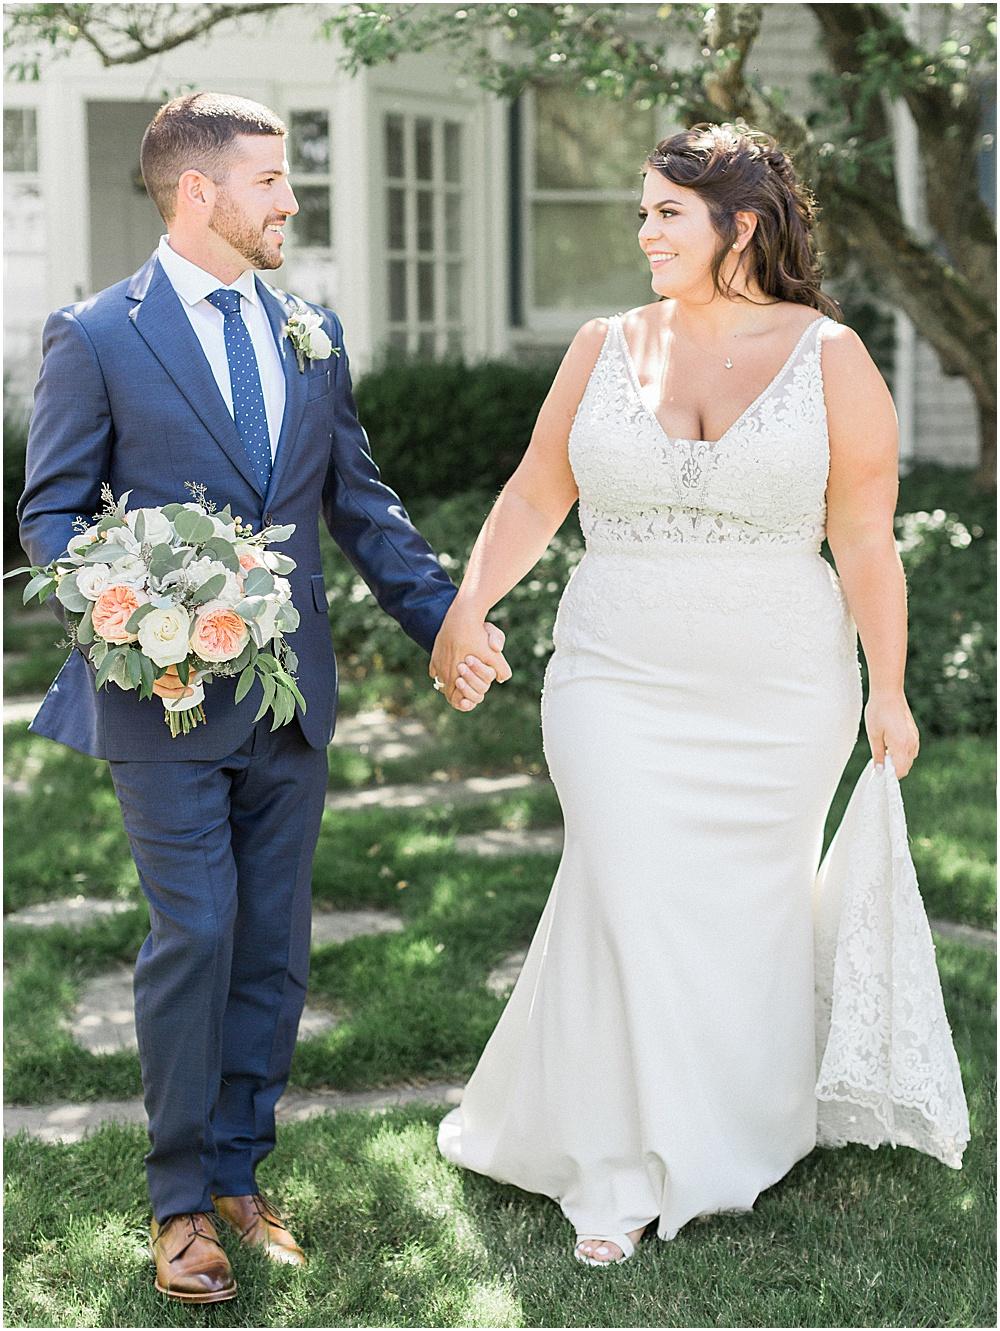 tabor_academy_rebecca_chris_tented_interior_trees_engagement_session_cape_cod_massachusetts_boston_wedding_photographer_meredith_jane_photography_photo_0699.jpg